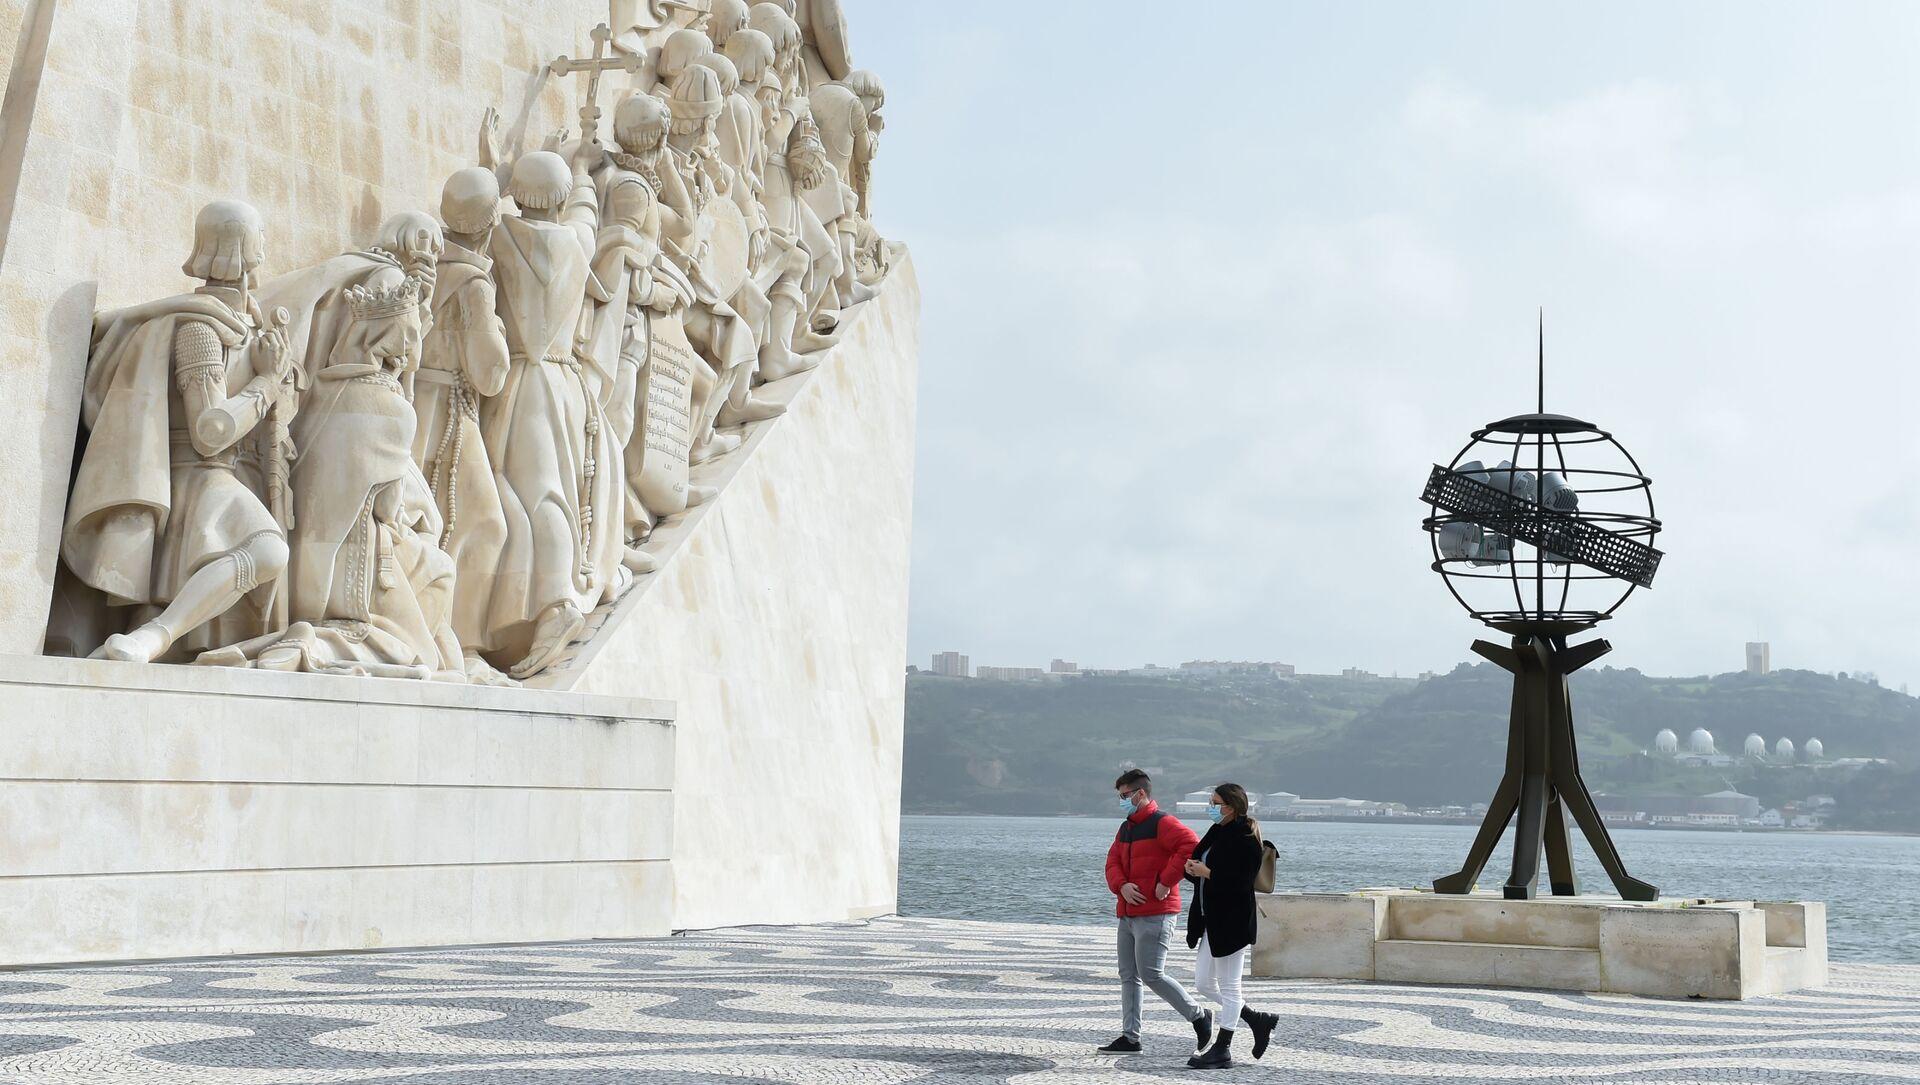 Lockdown in Portogallo - Sputnik Italia, 1920, 23.03.2021